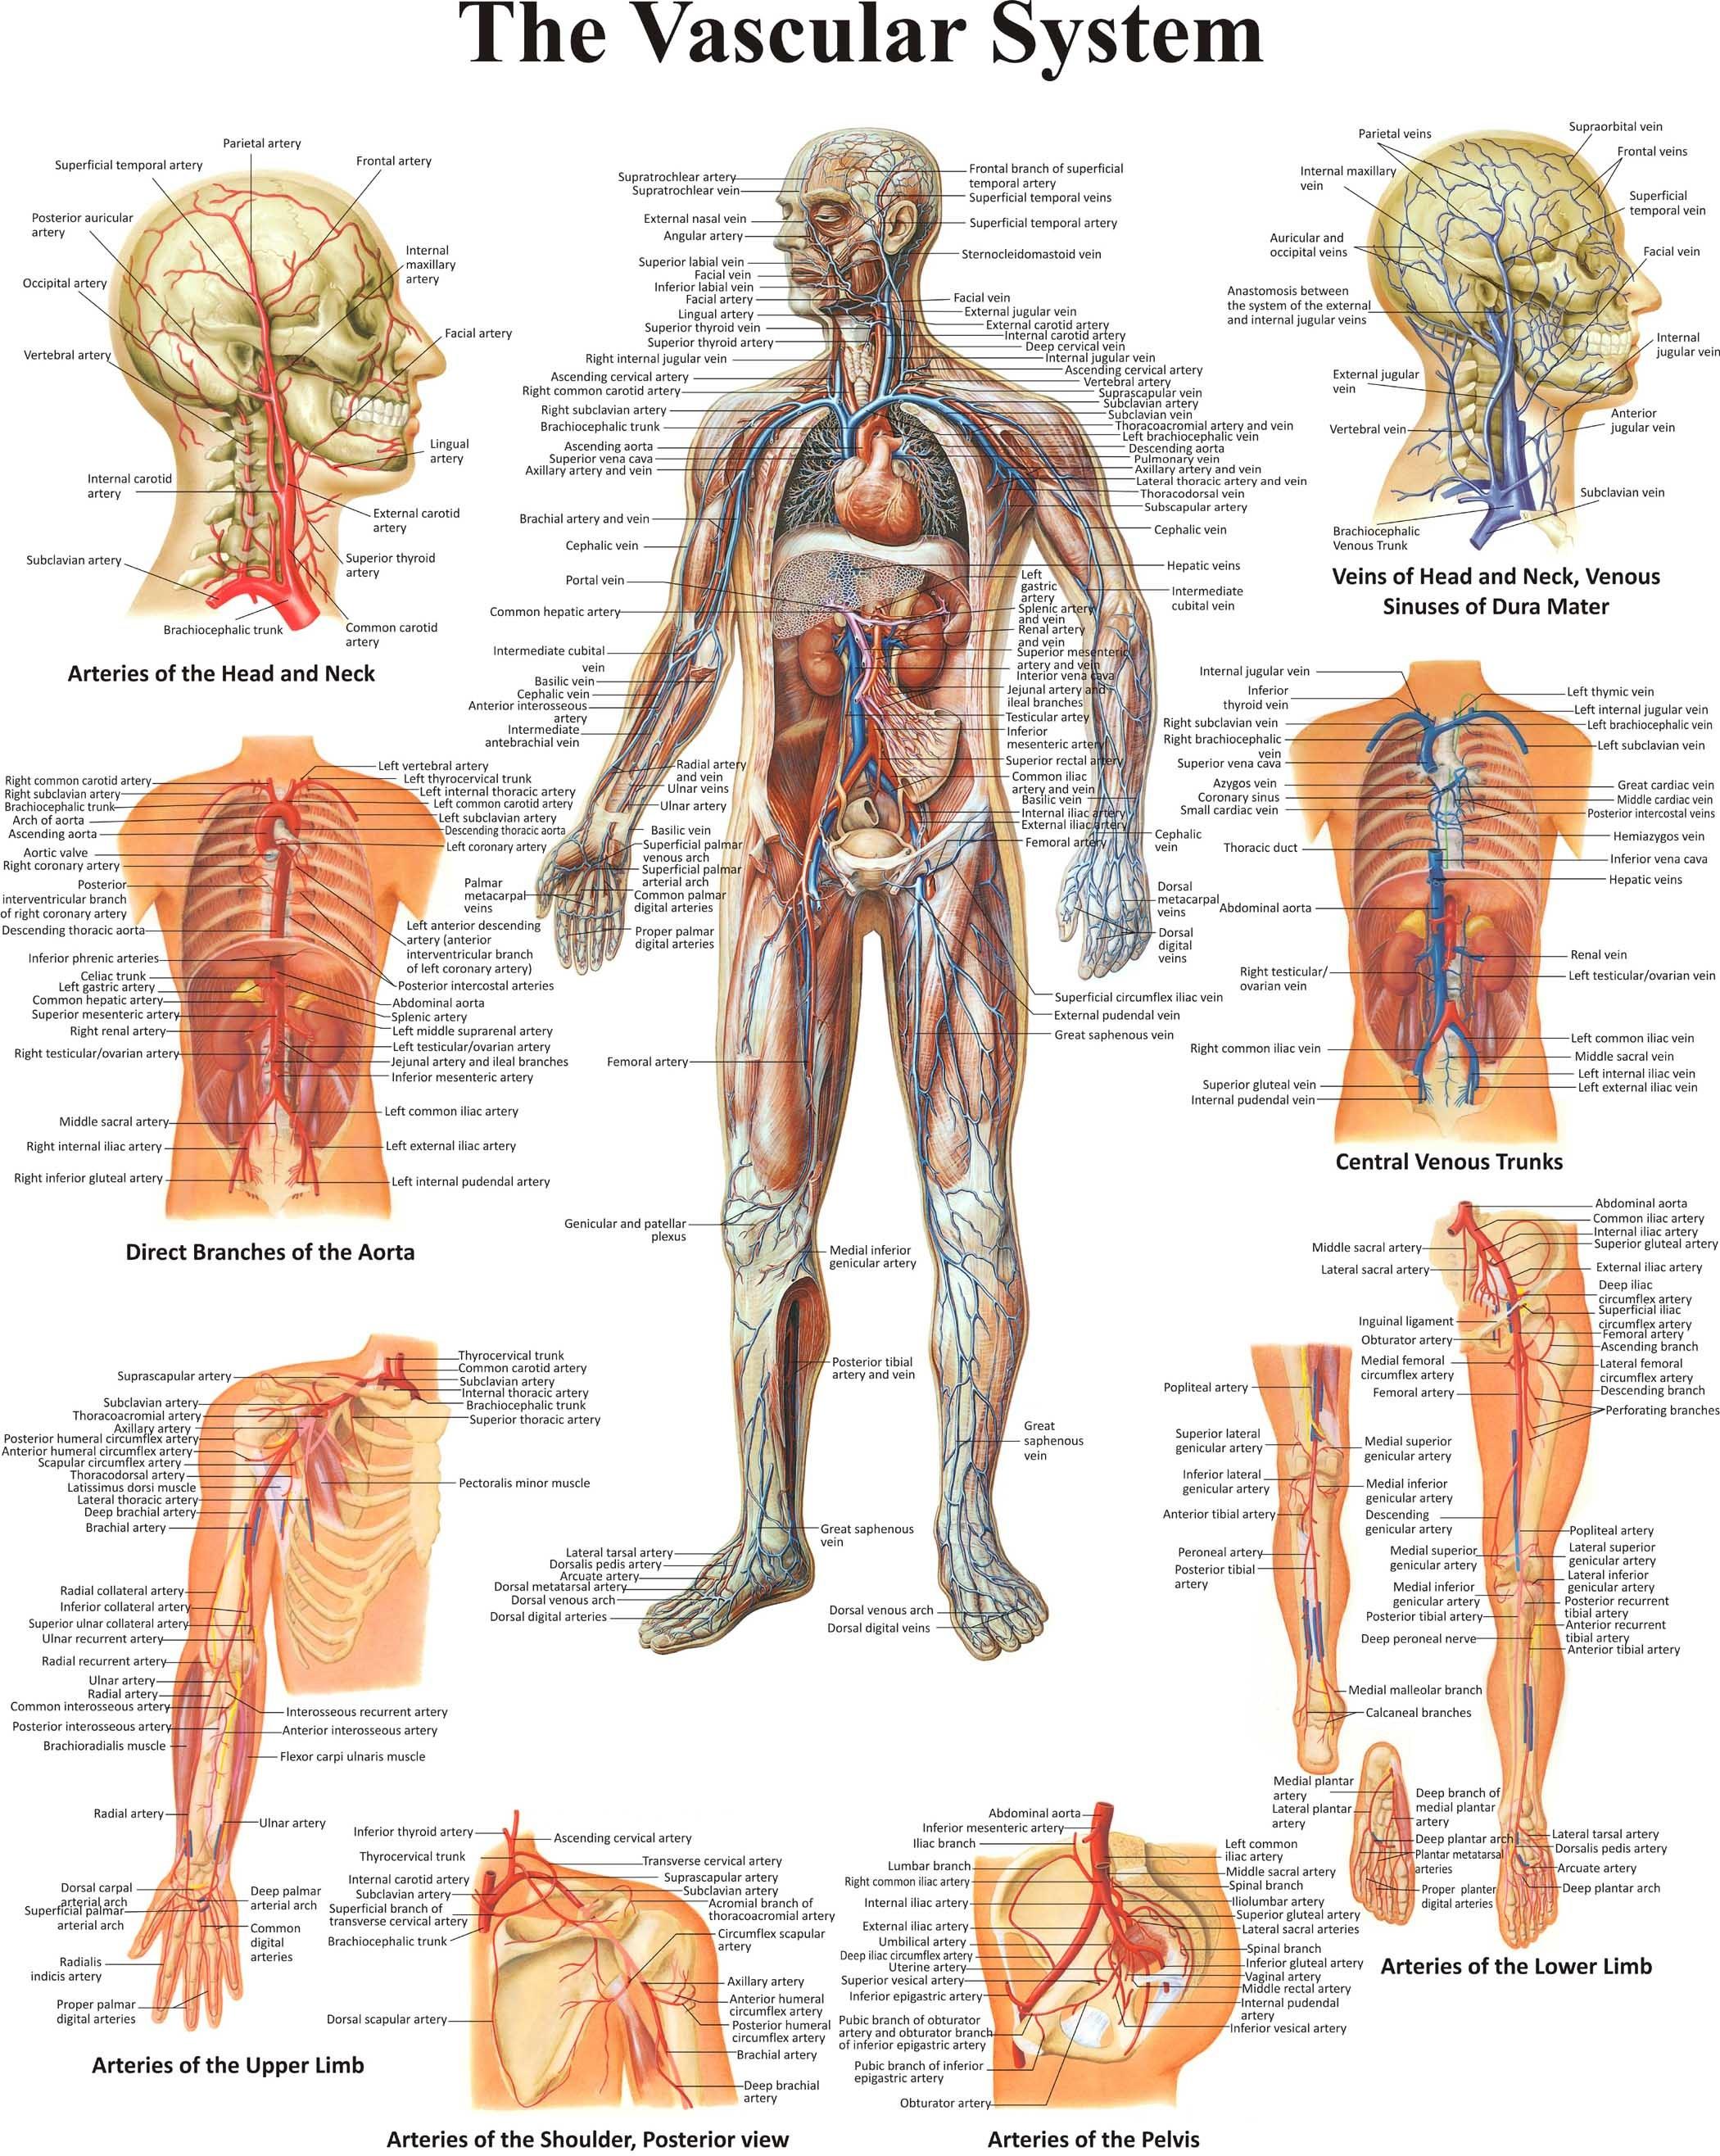 Magnificent Cardiac Veins Anatomy Ideas Physiology Of Human Body